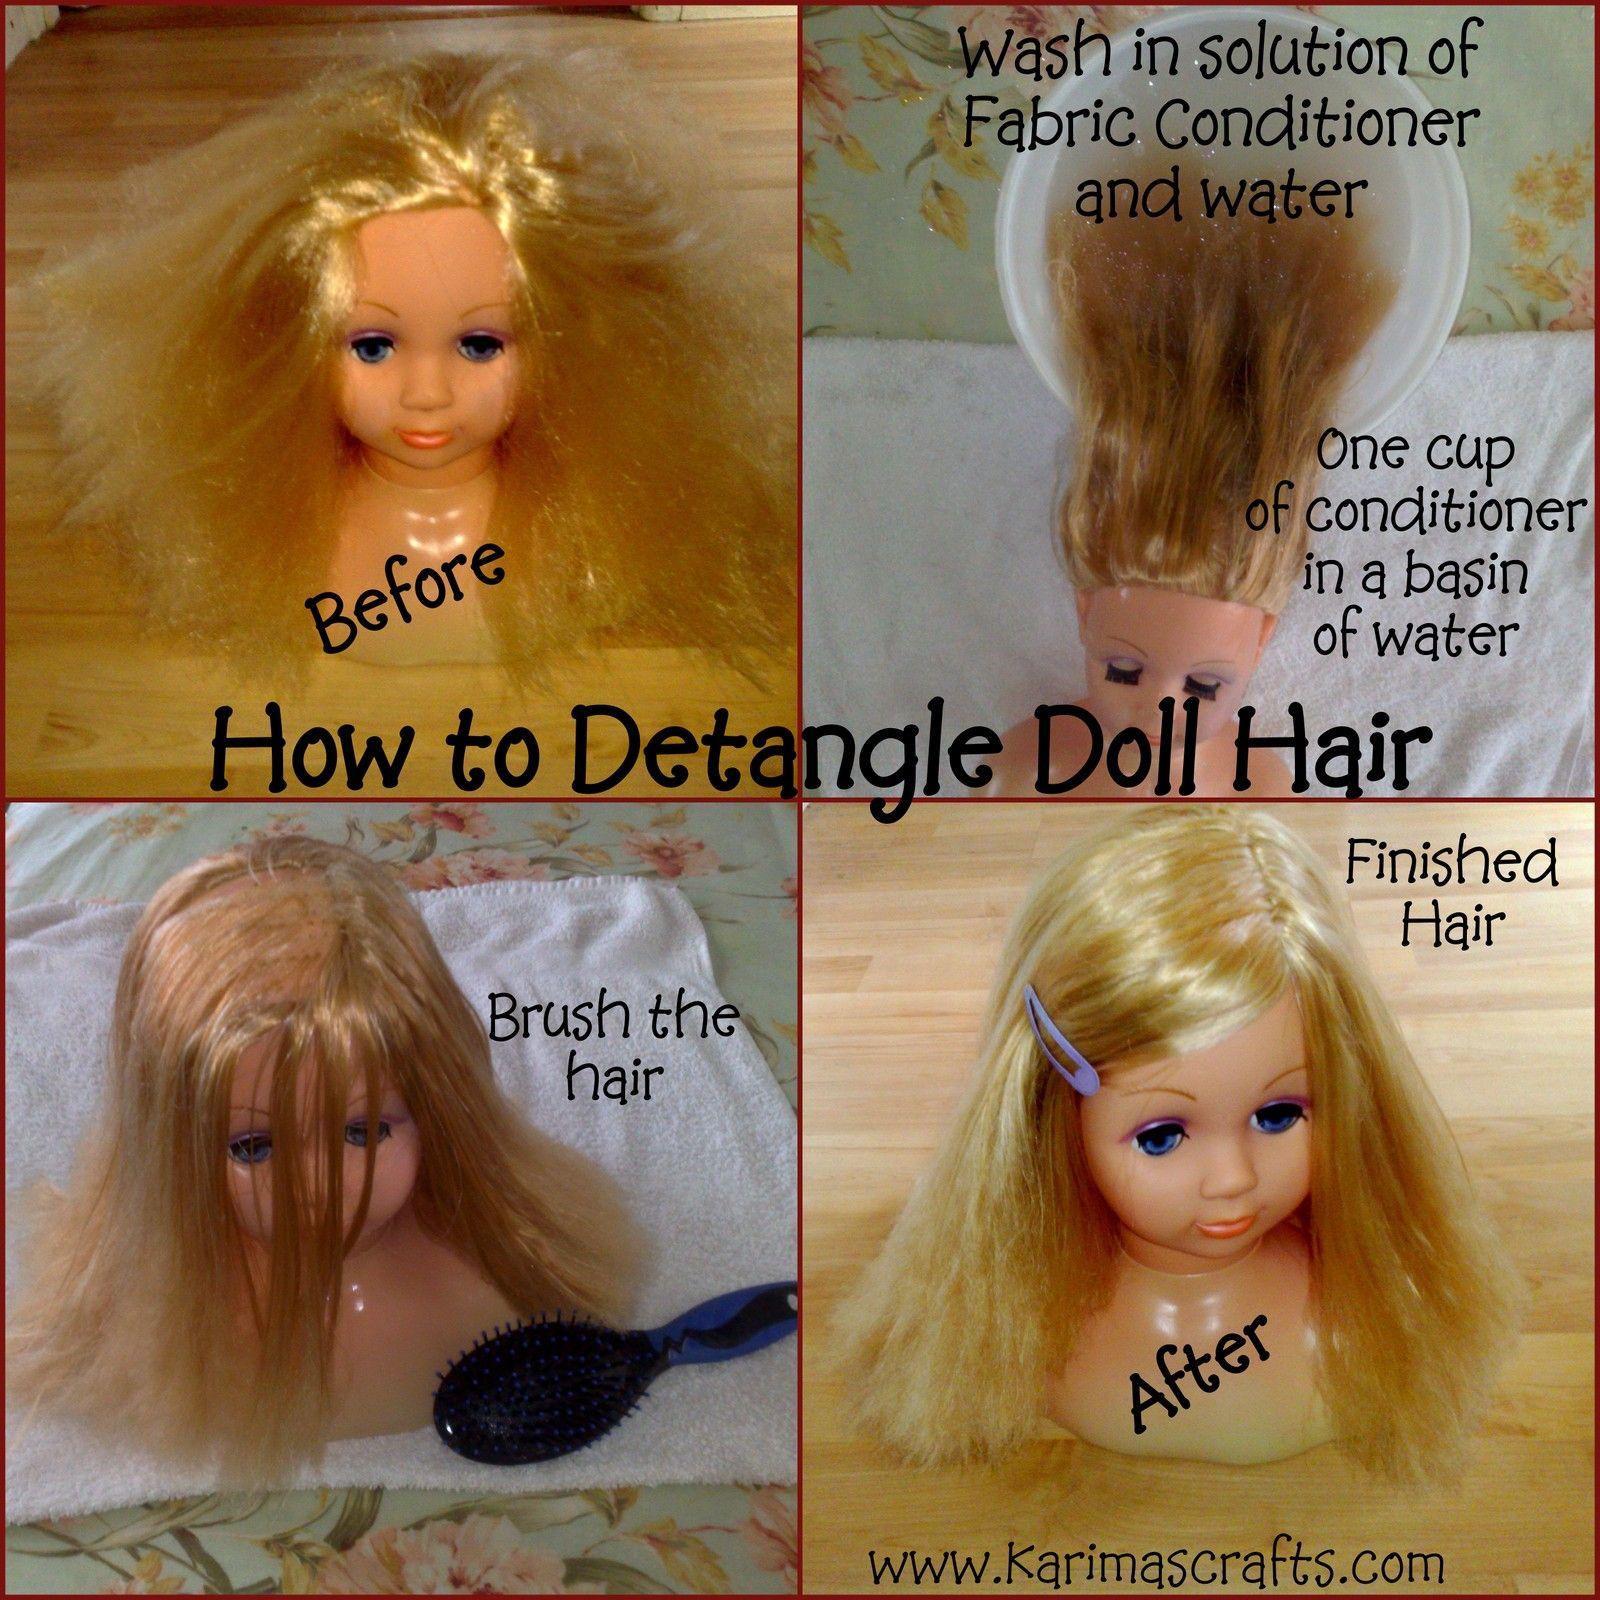 Karima S Crafts How To Detangle Doll Hair Tutorial Doll Hair Detangler Doll Hair Doll Hair Repair